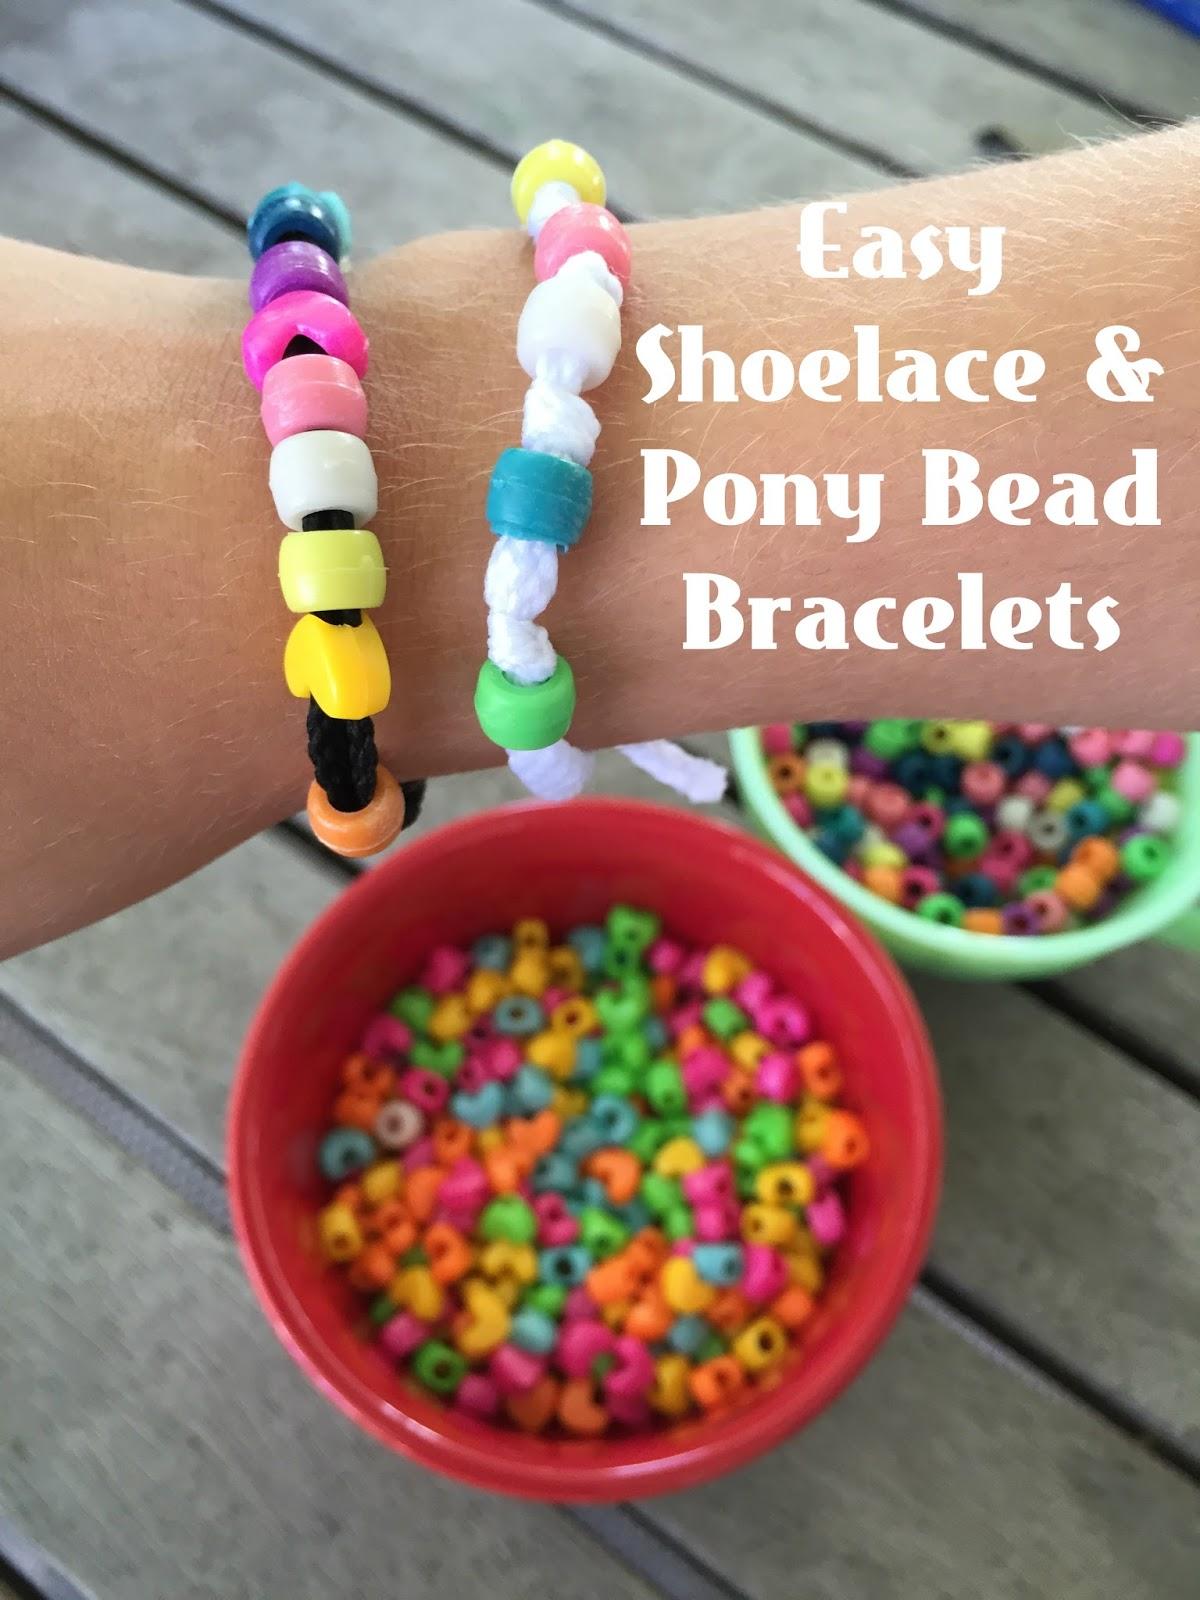 Be Brave, Keep Going: Easy Pony Bead Bracelet